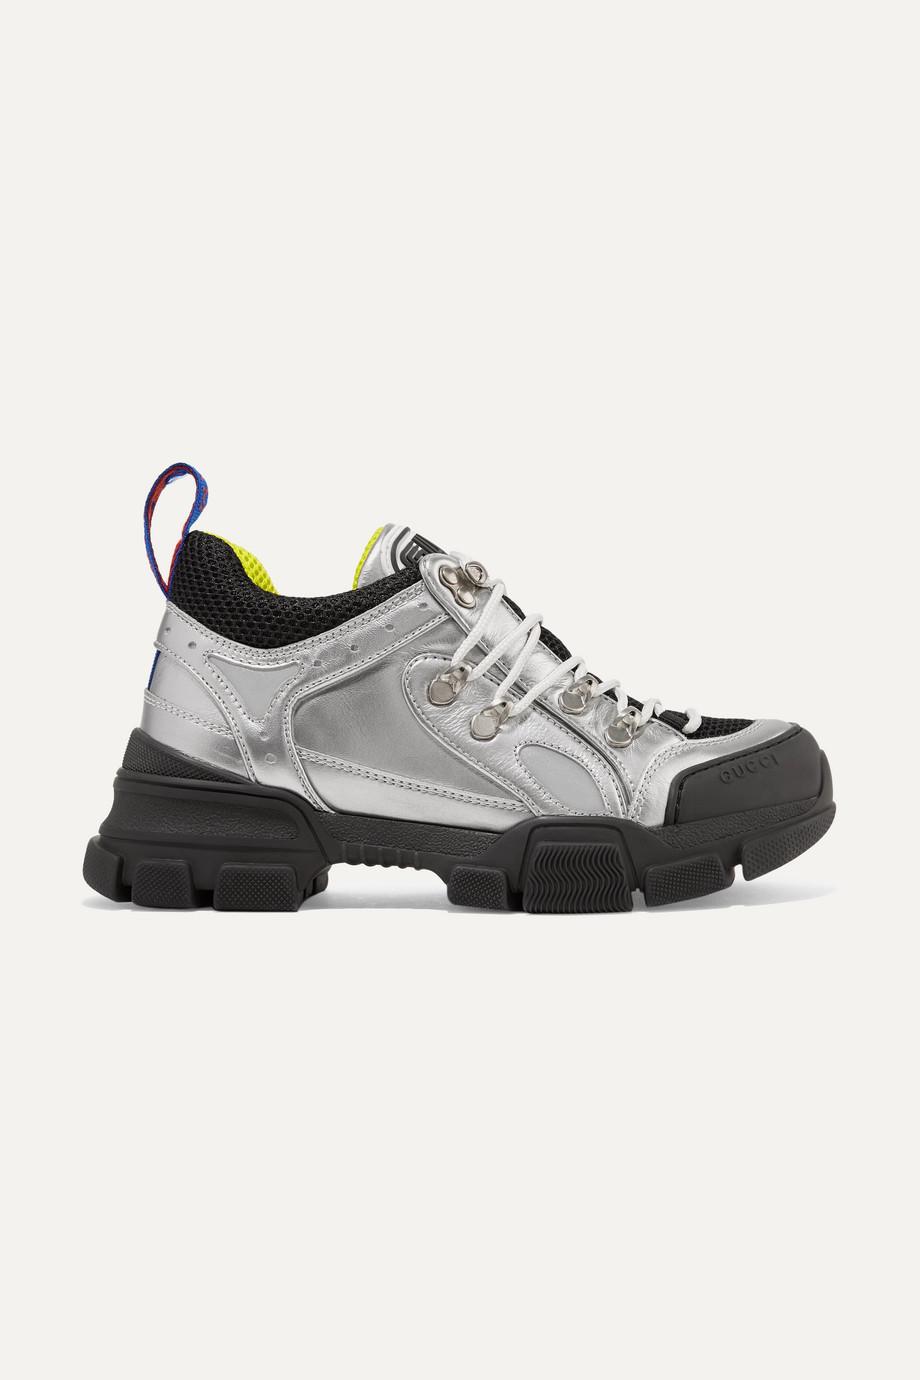 Flashtrek metallic leather and mesh sneakers